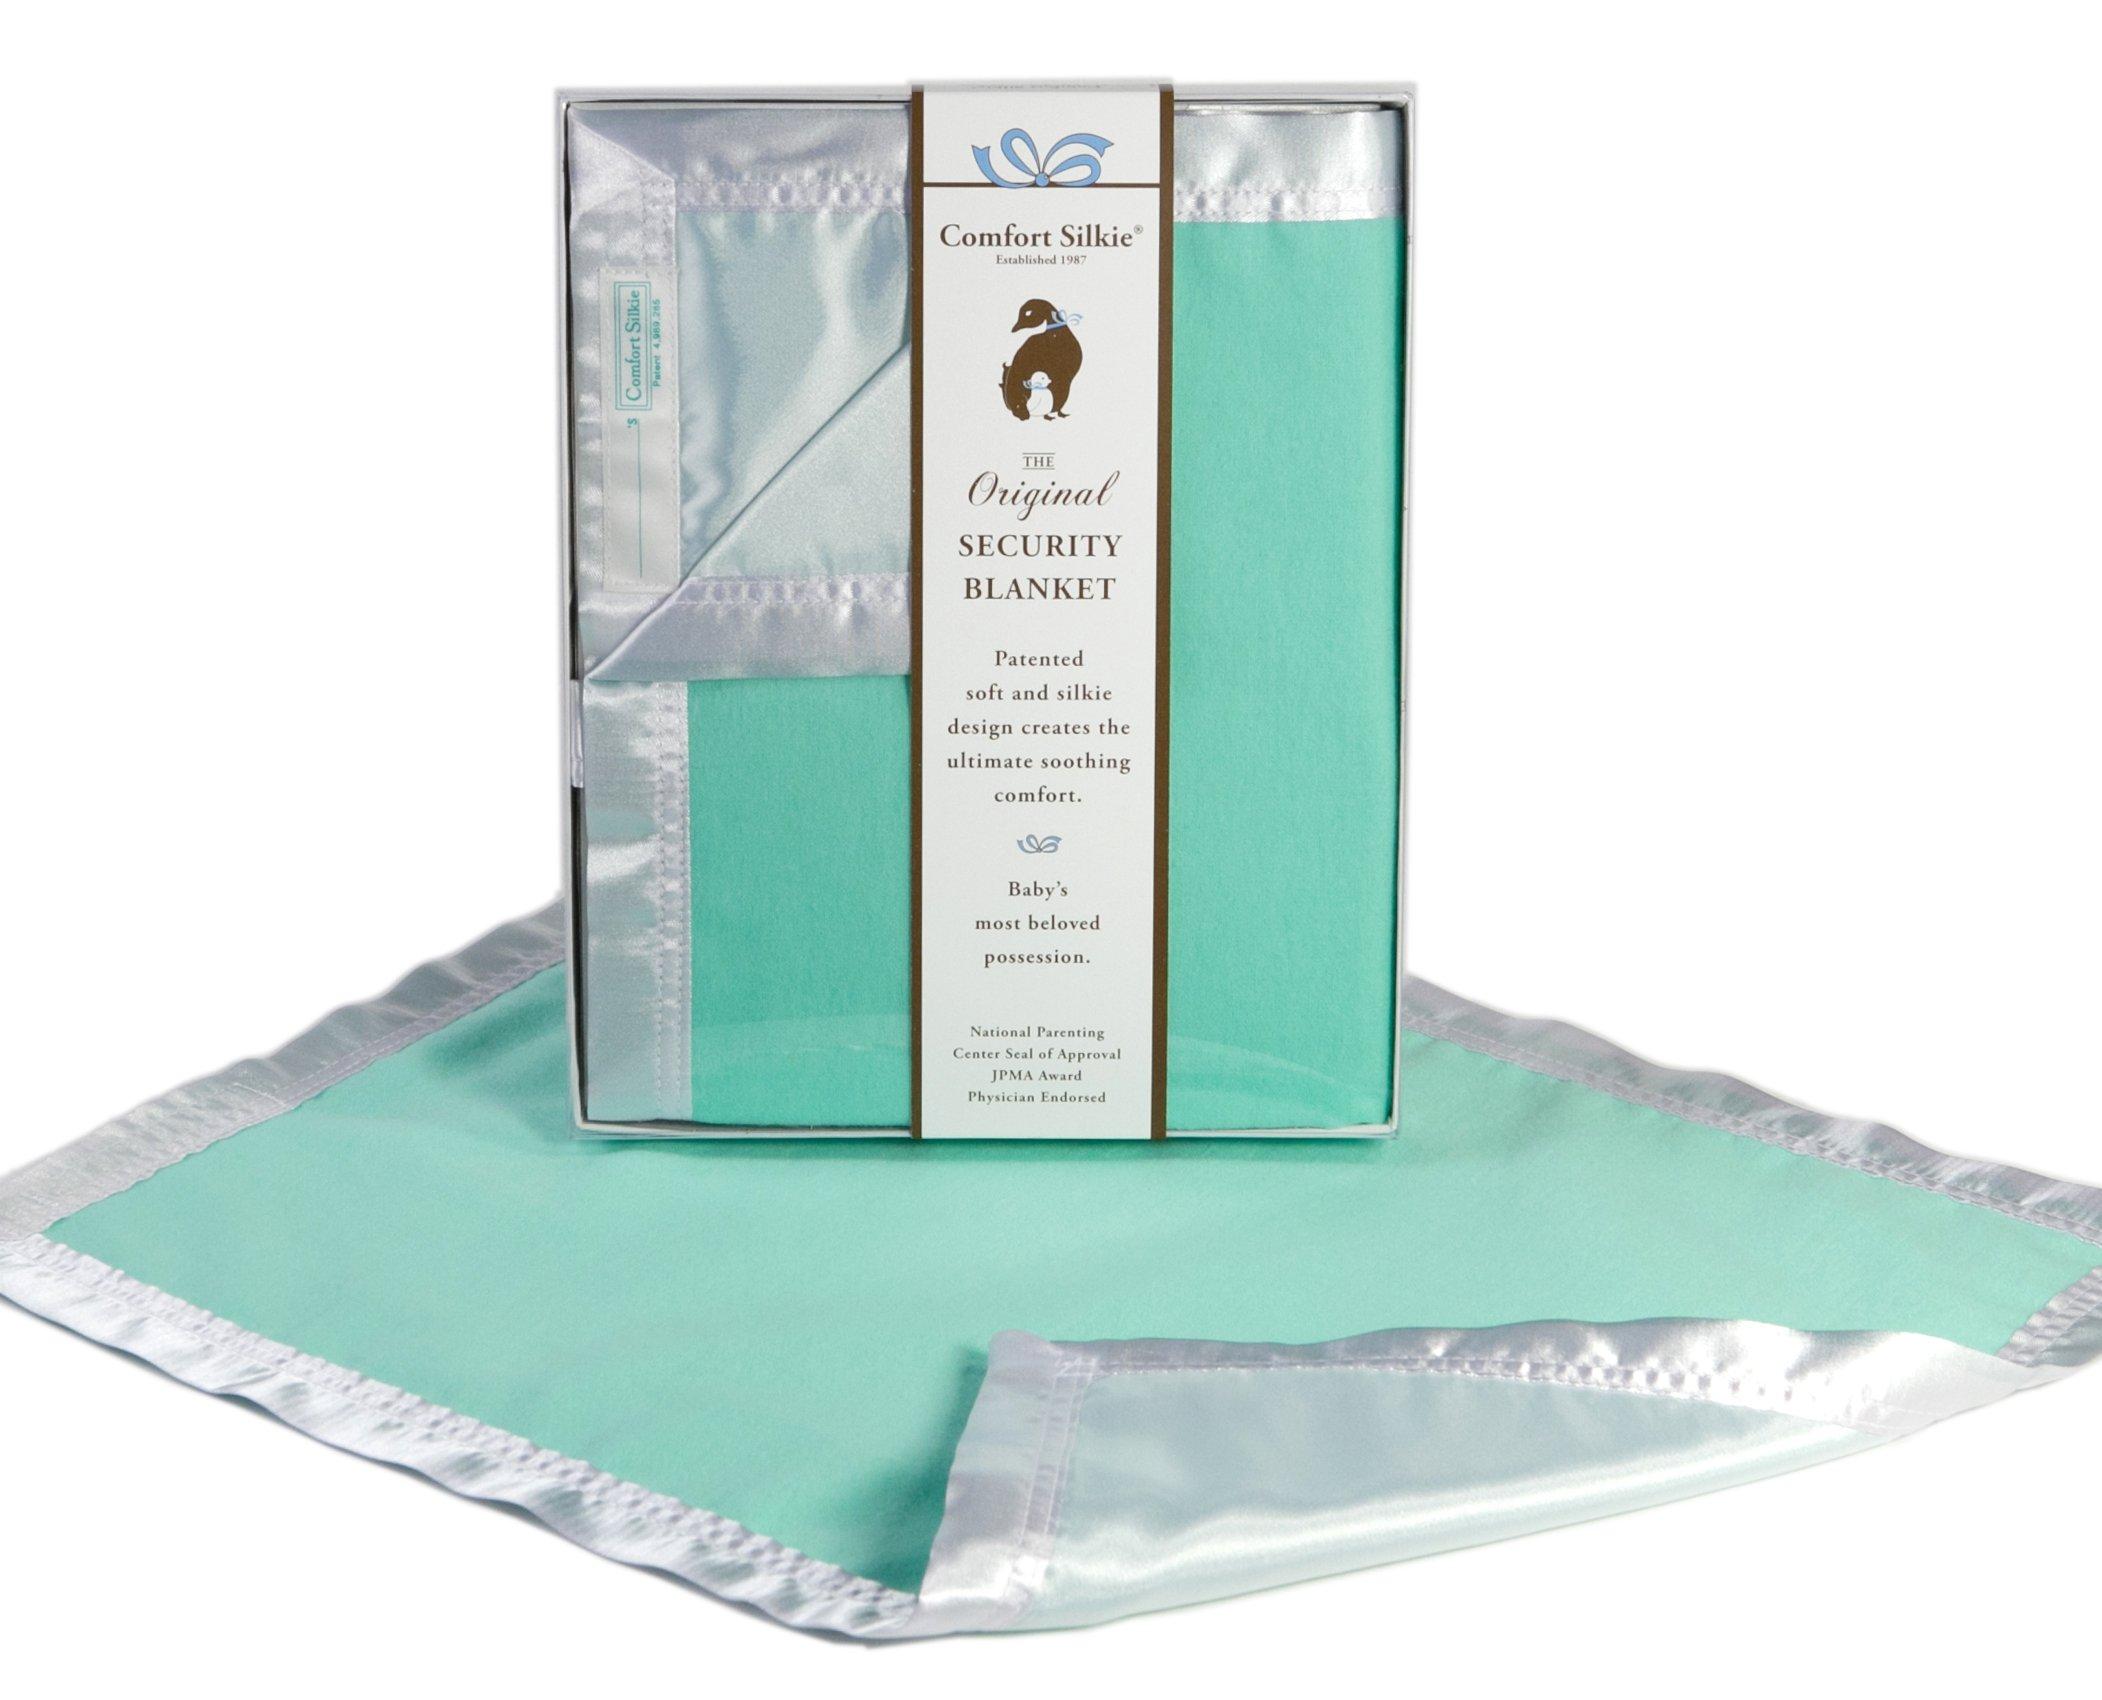 Mint COMFORT SILKIE Security Blanket ~ The Original. The Best. Award Winning.